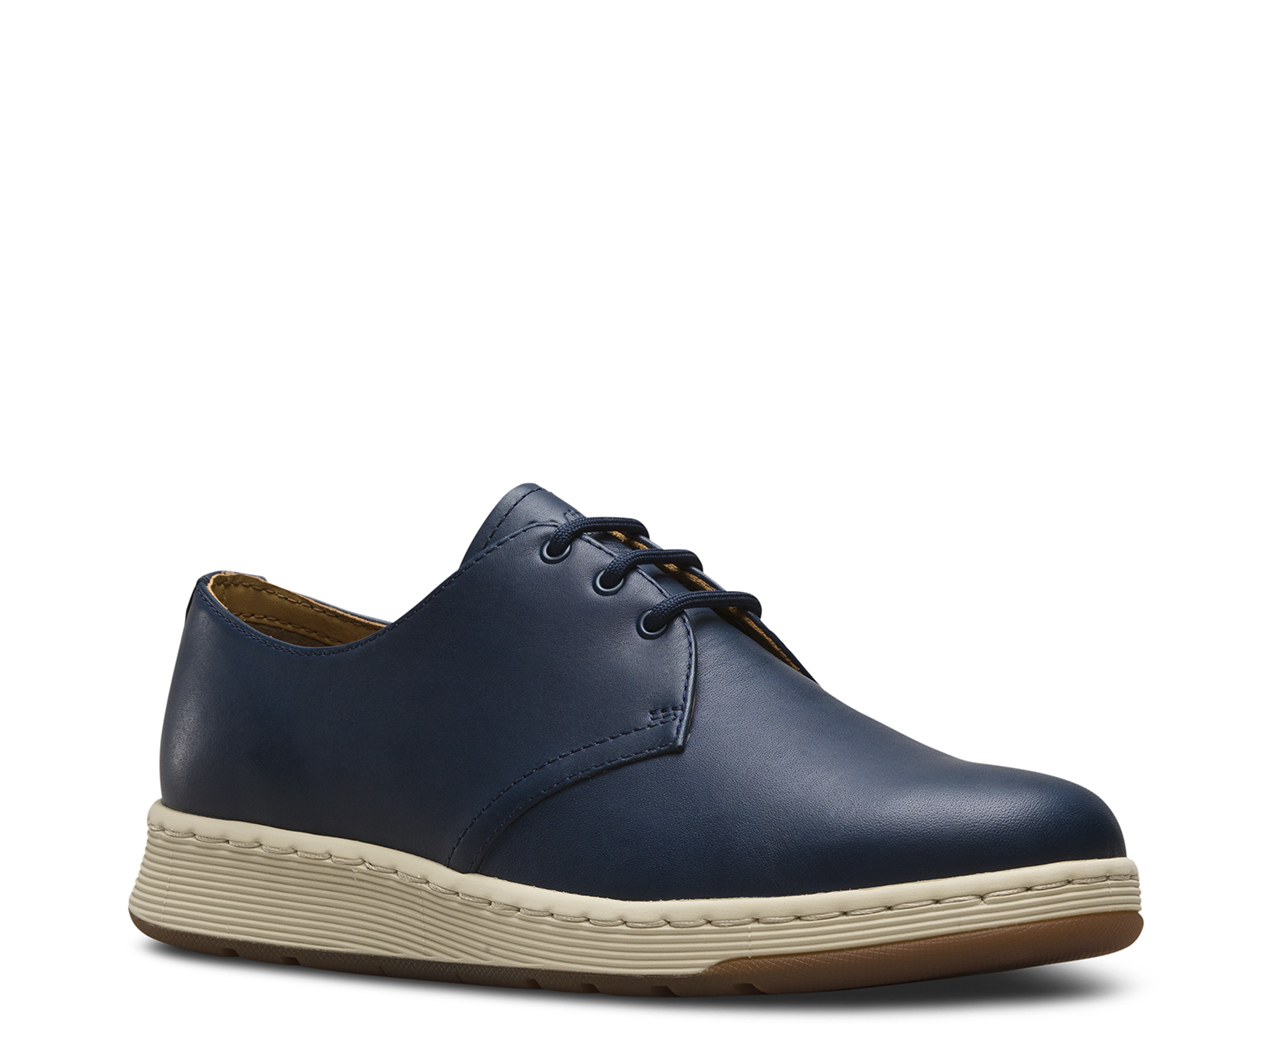 Dr. Martens Womens Cavendish 3-Eyelet Black Leather Shoes 39 EU CYCEUV